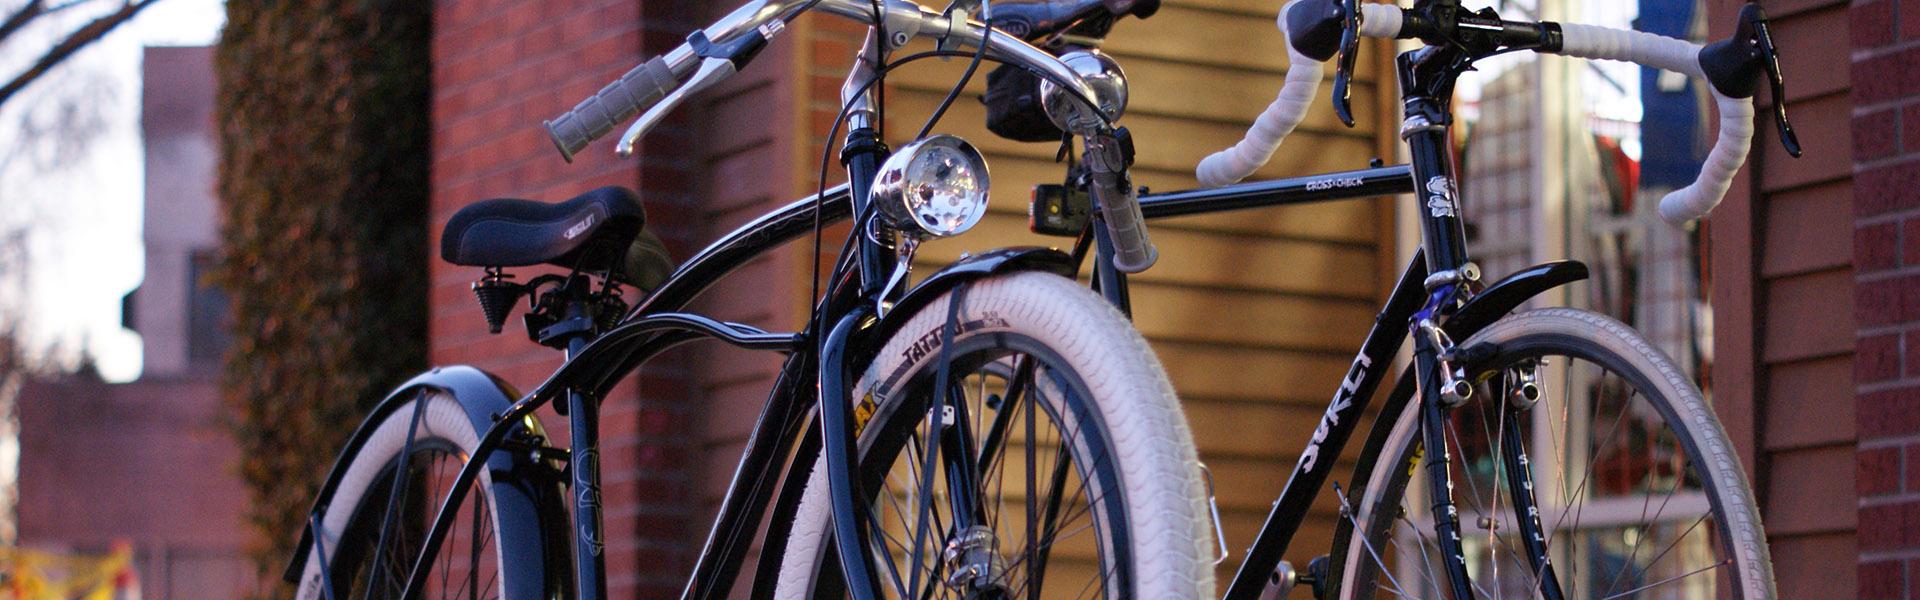 Tread Bikes